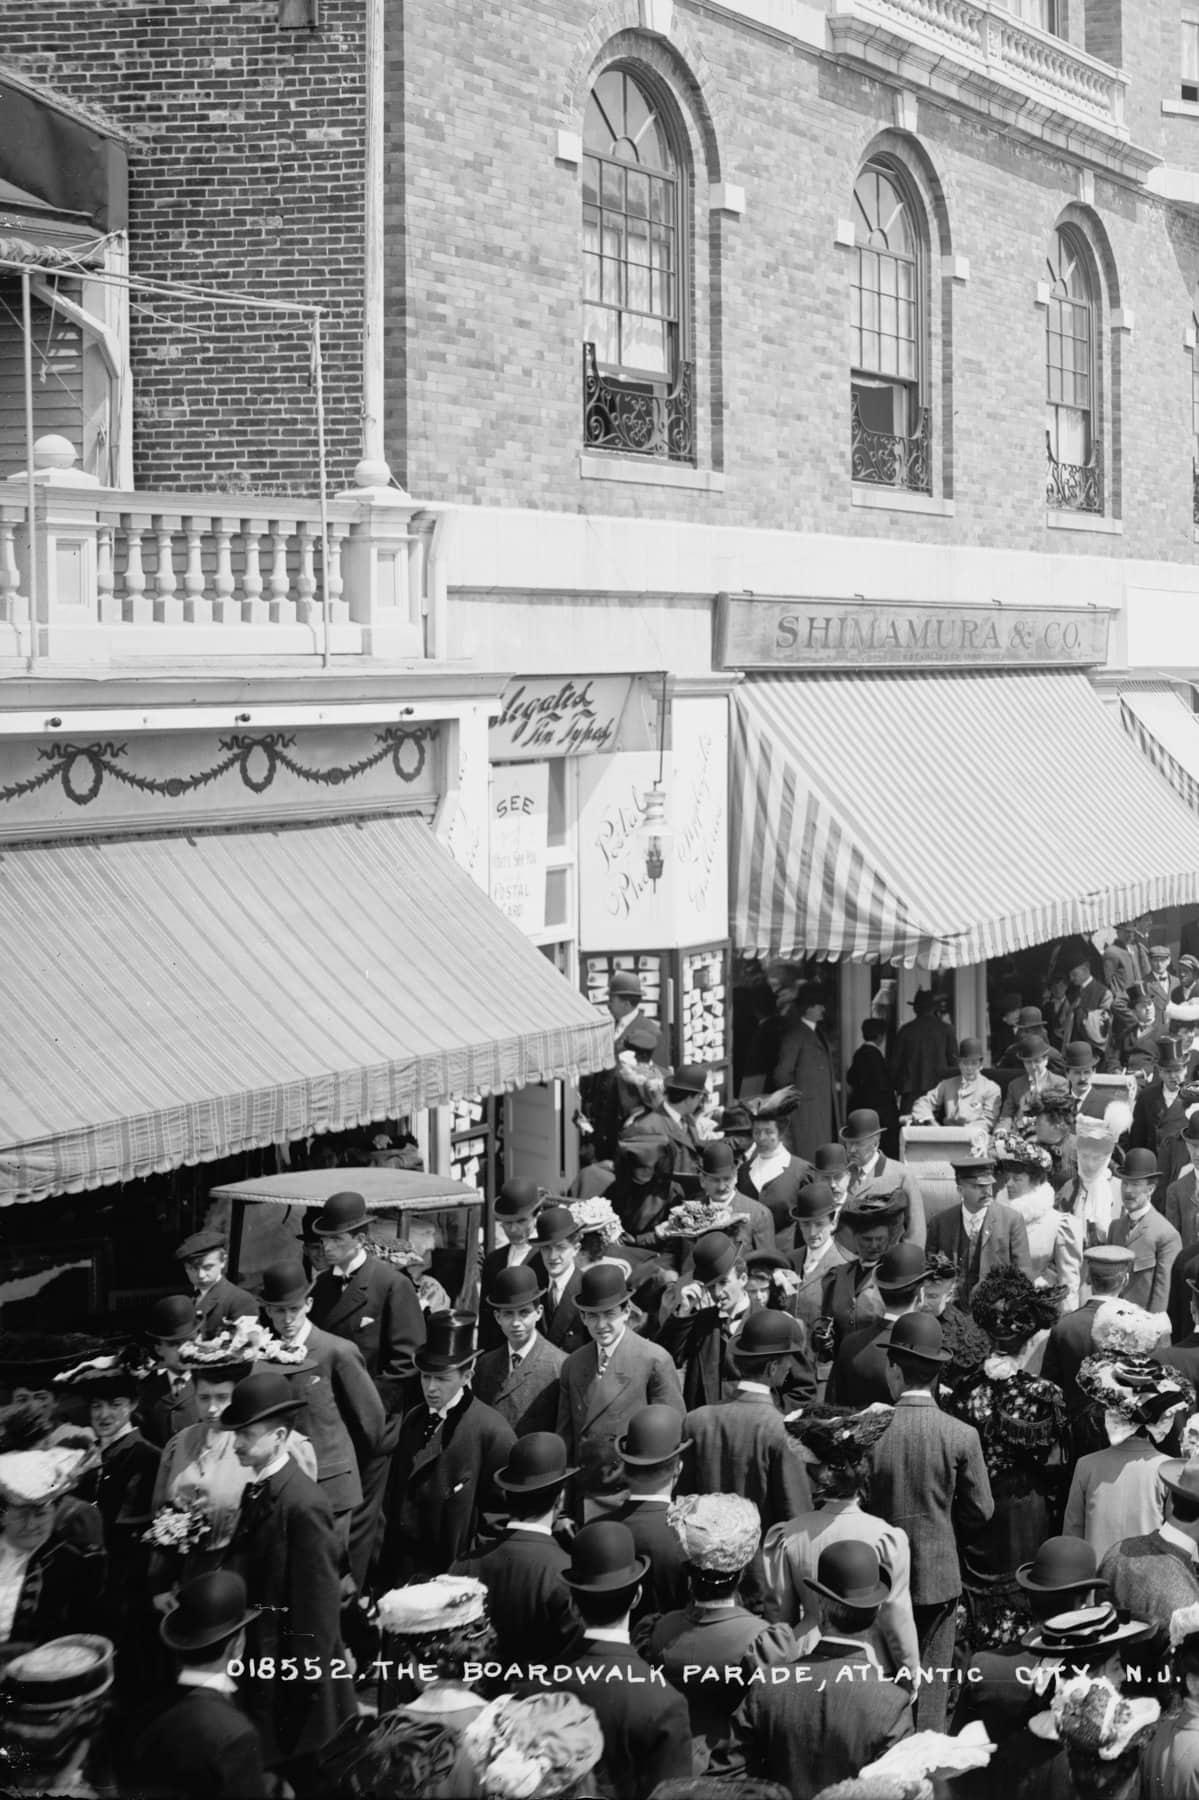 The Boardwalk parade, Atlantic City (around 1905)